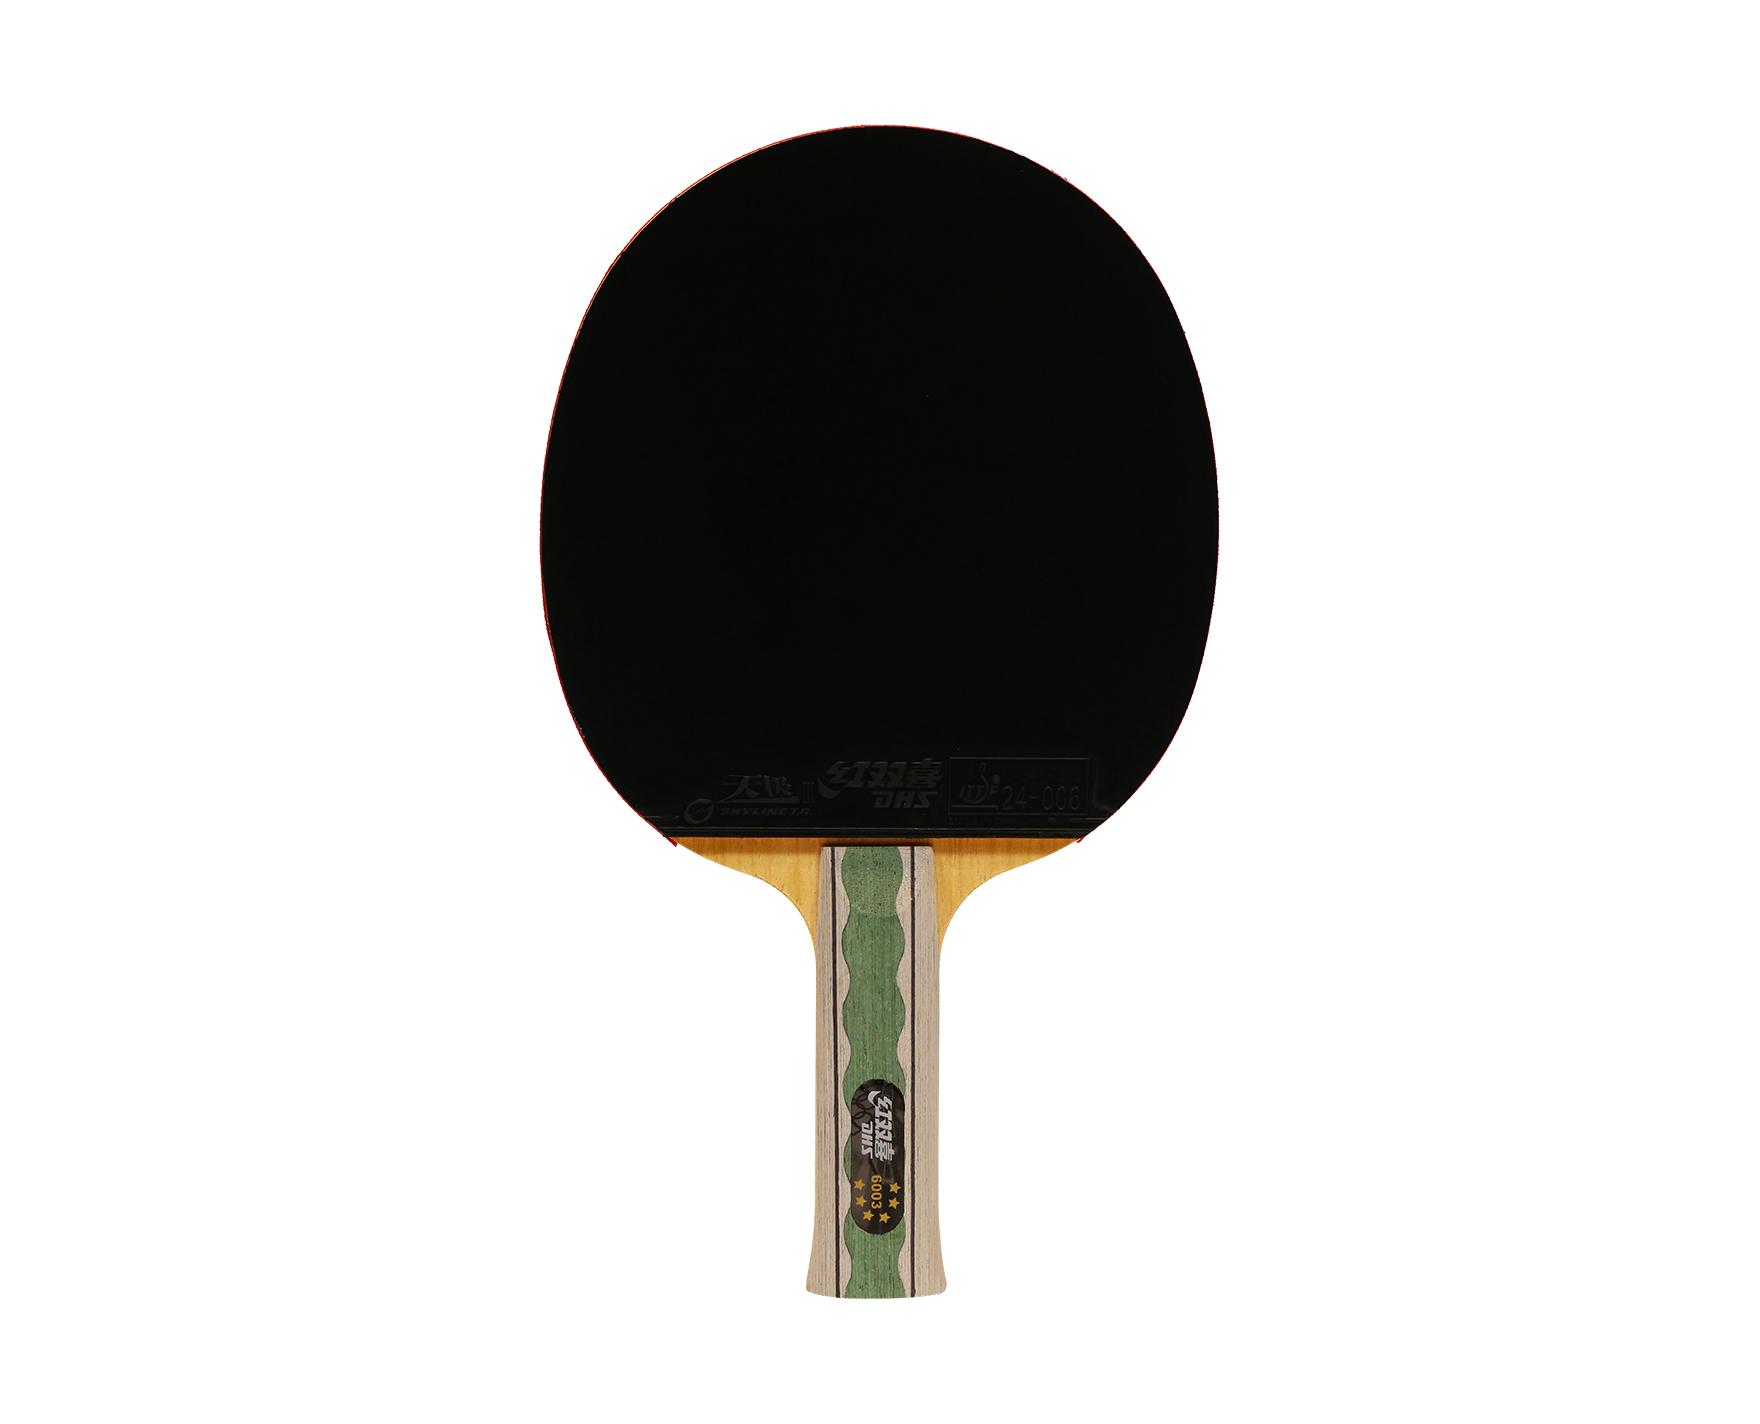 Thailand table tennis online shop